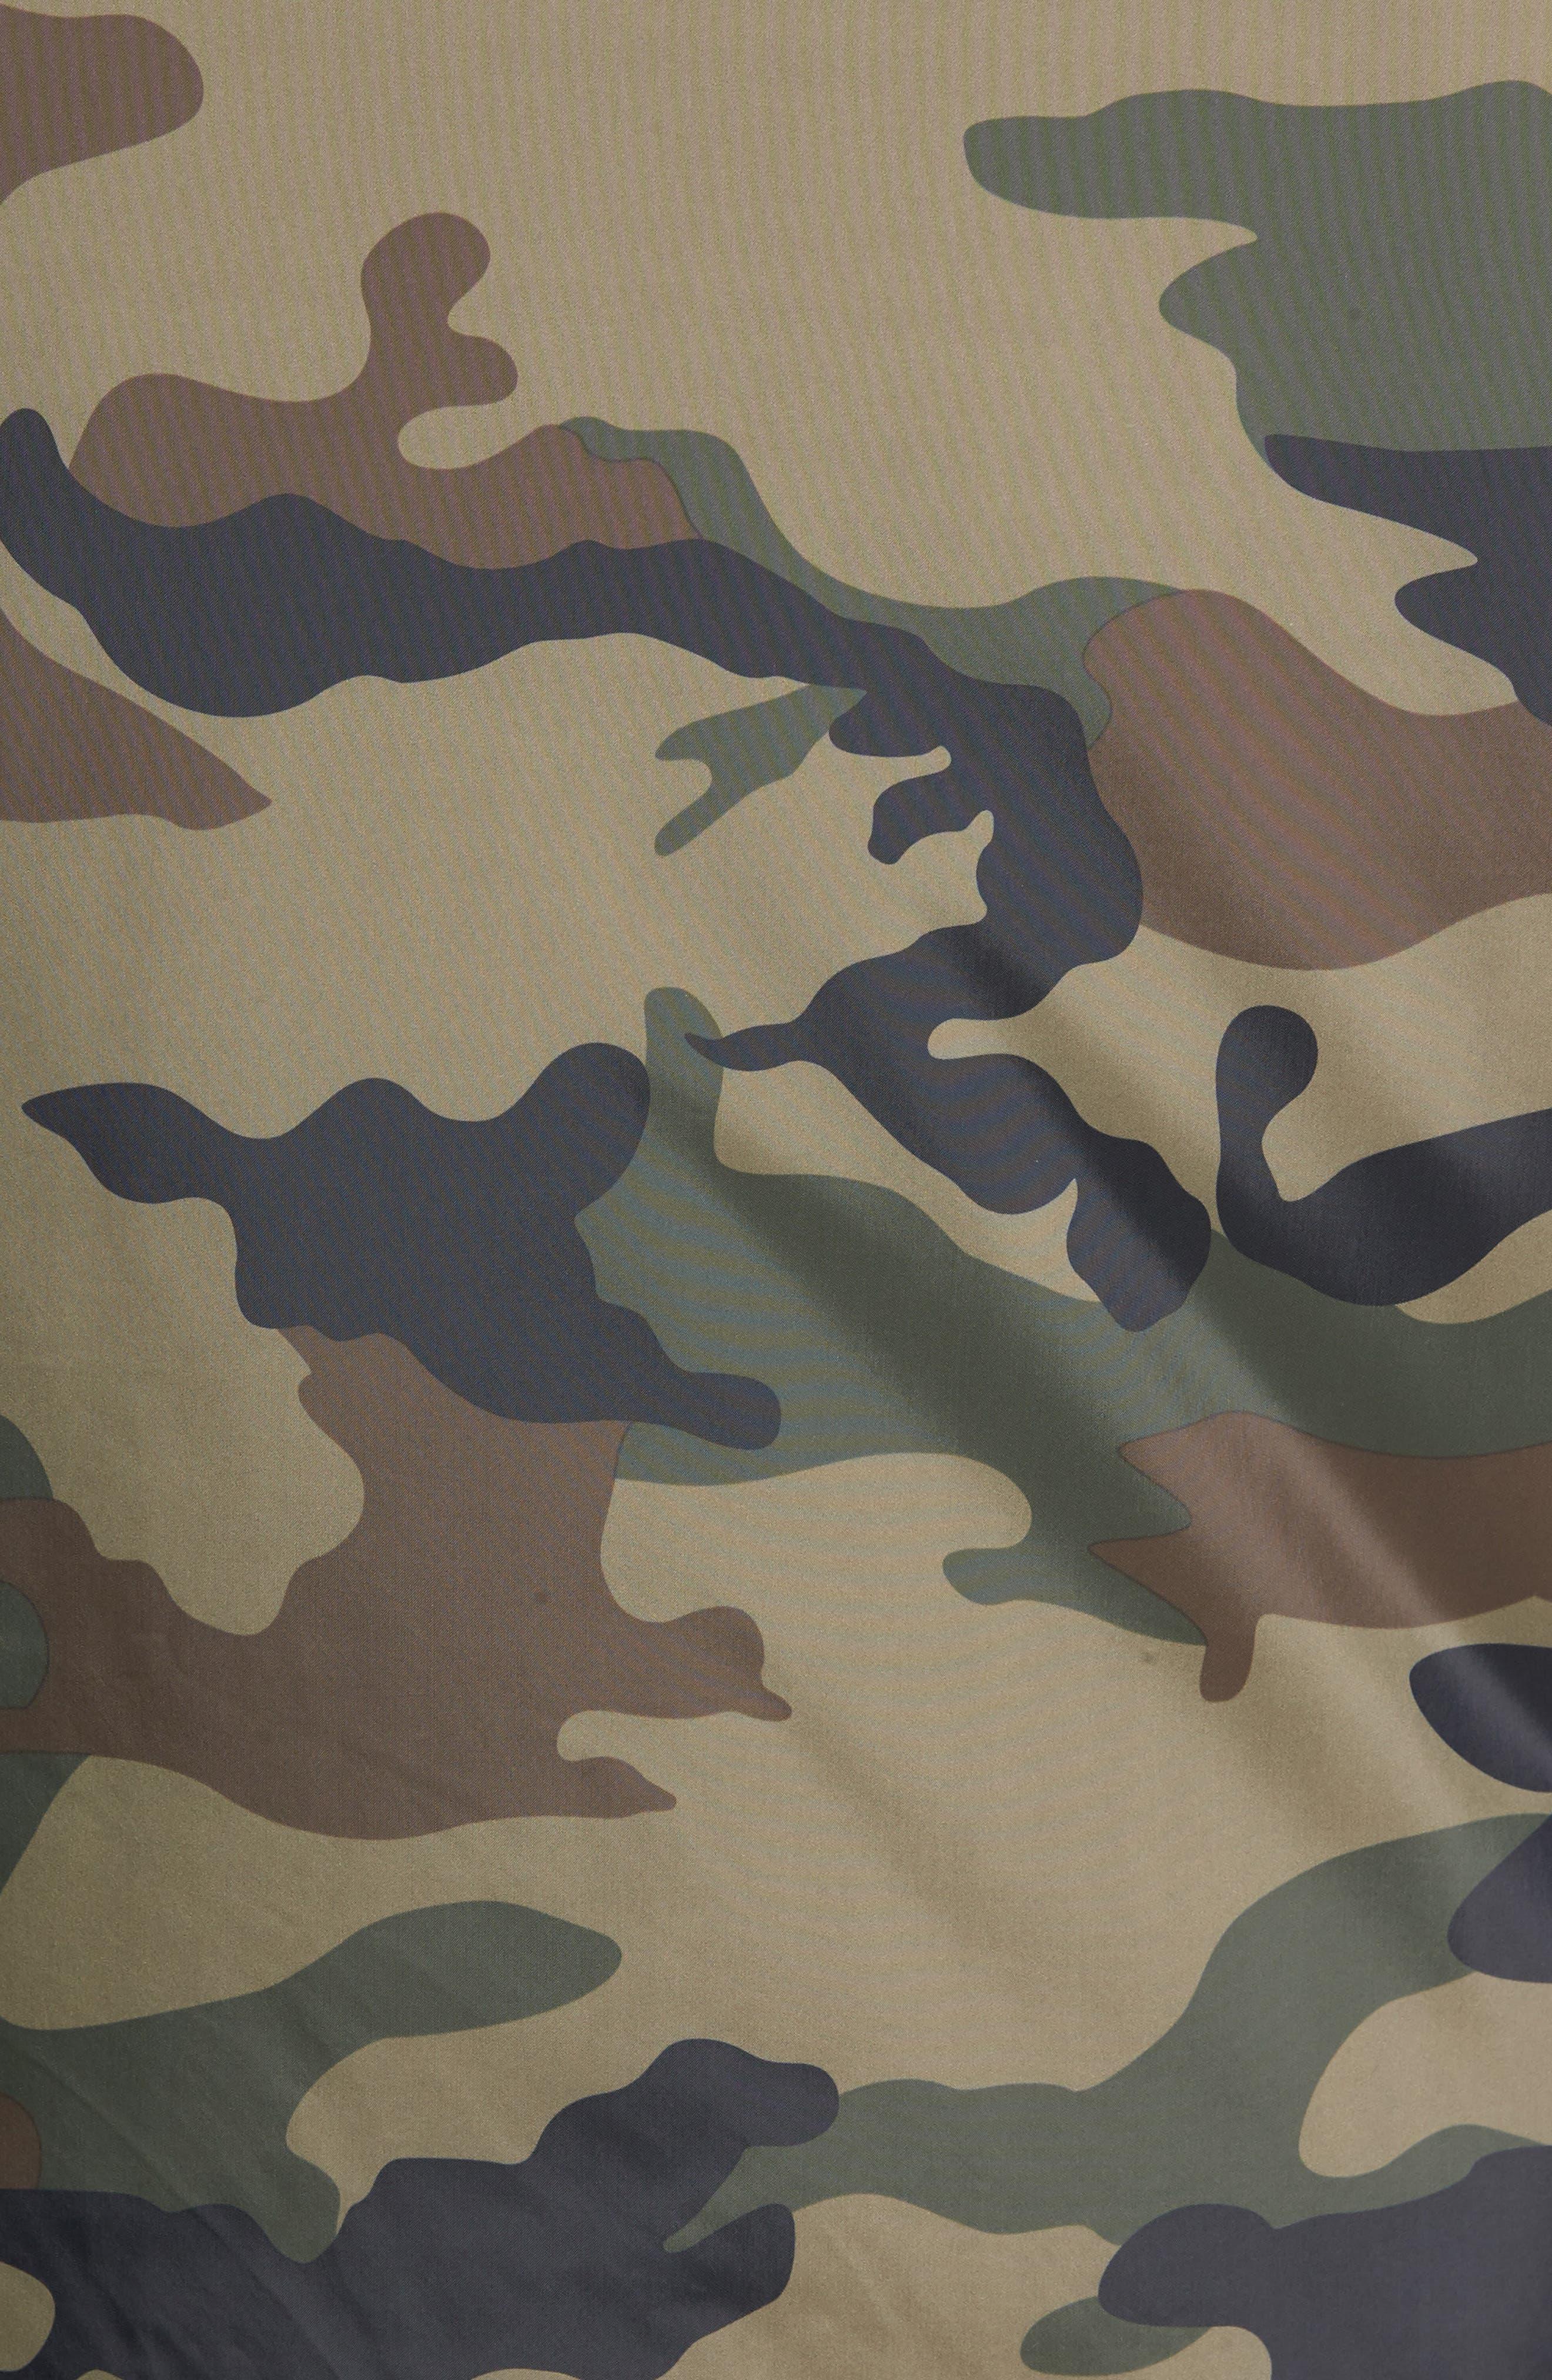 Buckhorn Slim Reversible Jacket,                             Alternate thumbnail 8, color,                             SPRIG